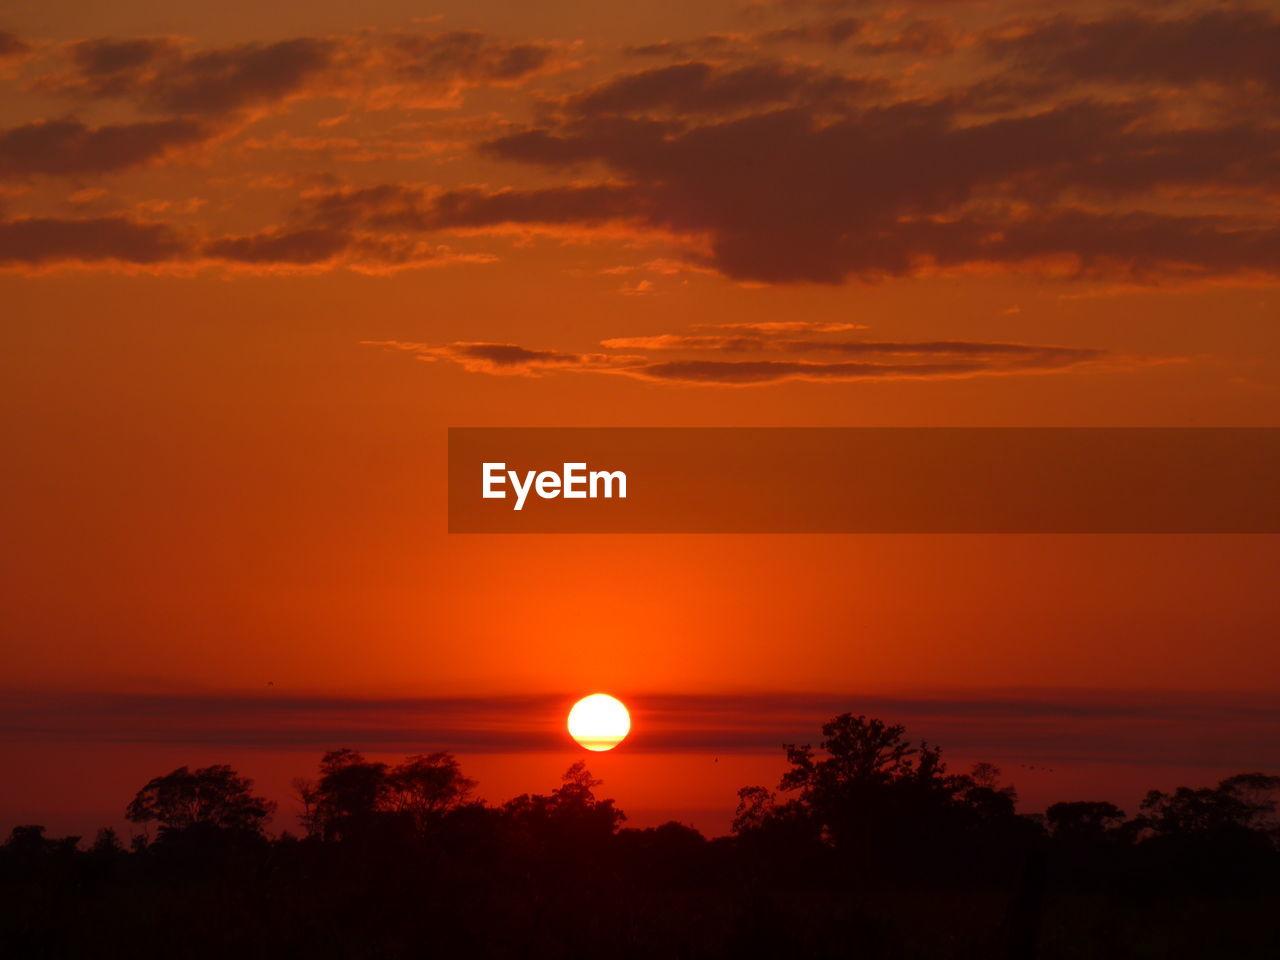 sky, beauty in nature, sunset, scenics - nature, tranquility, tranquil scene, orange color, cloud - sky, silhouette, sun, tree, idyllic, nature, plant, no people, outdoors, non-urban scene, sea, sunlight, water, romantic sky, eclipse